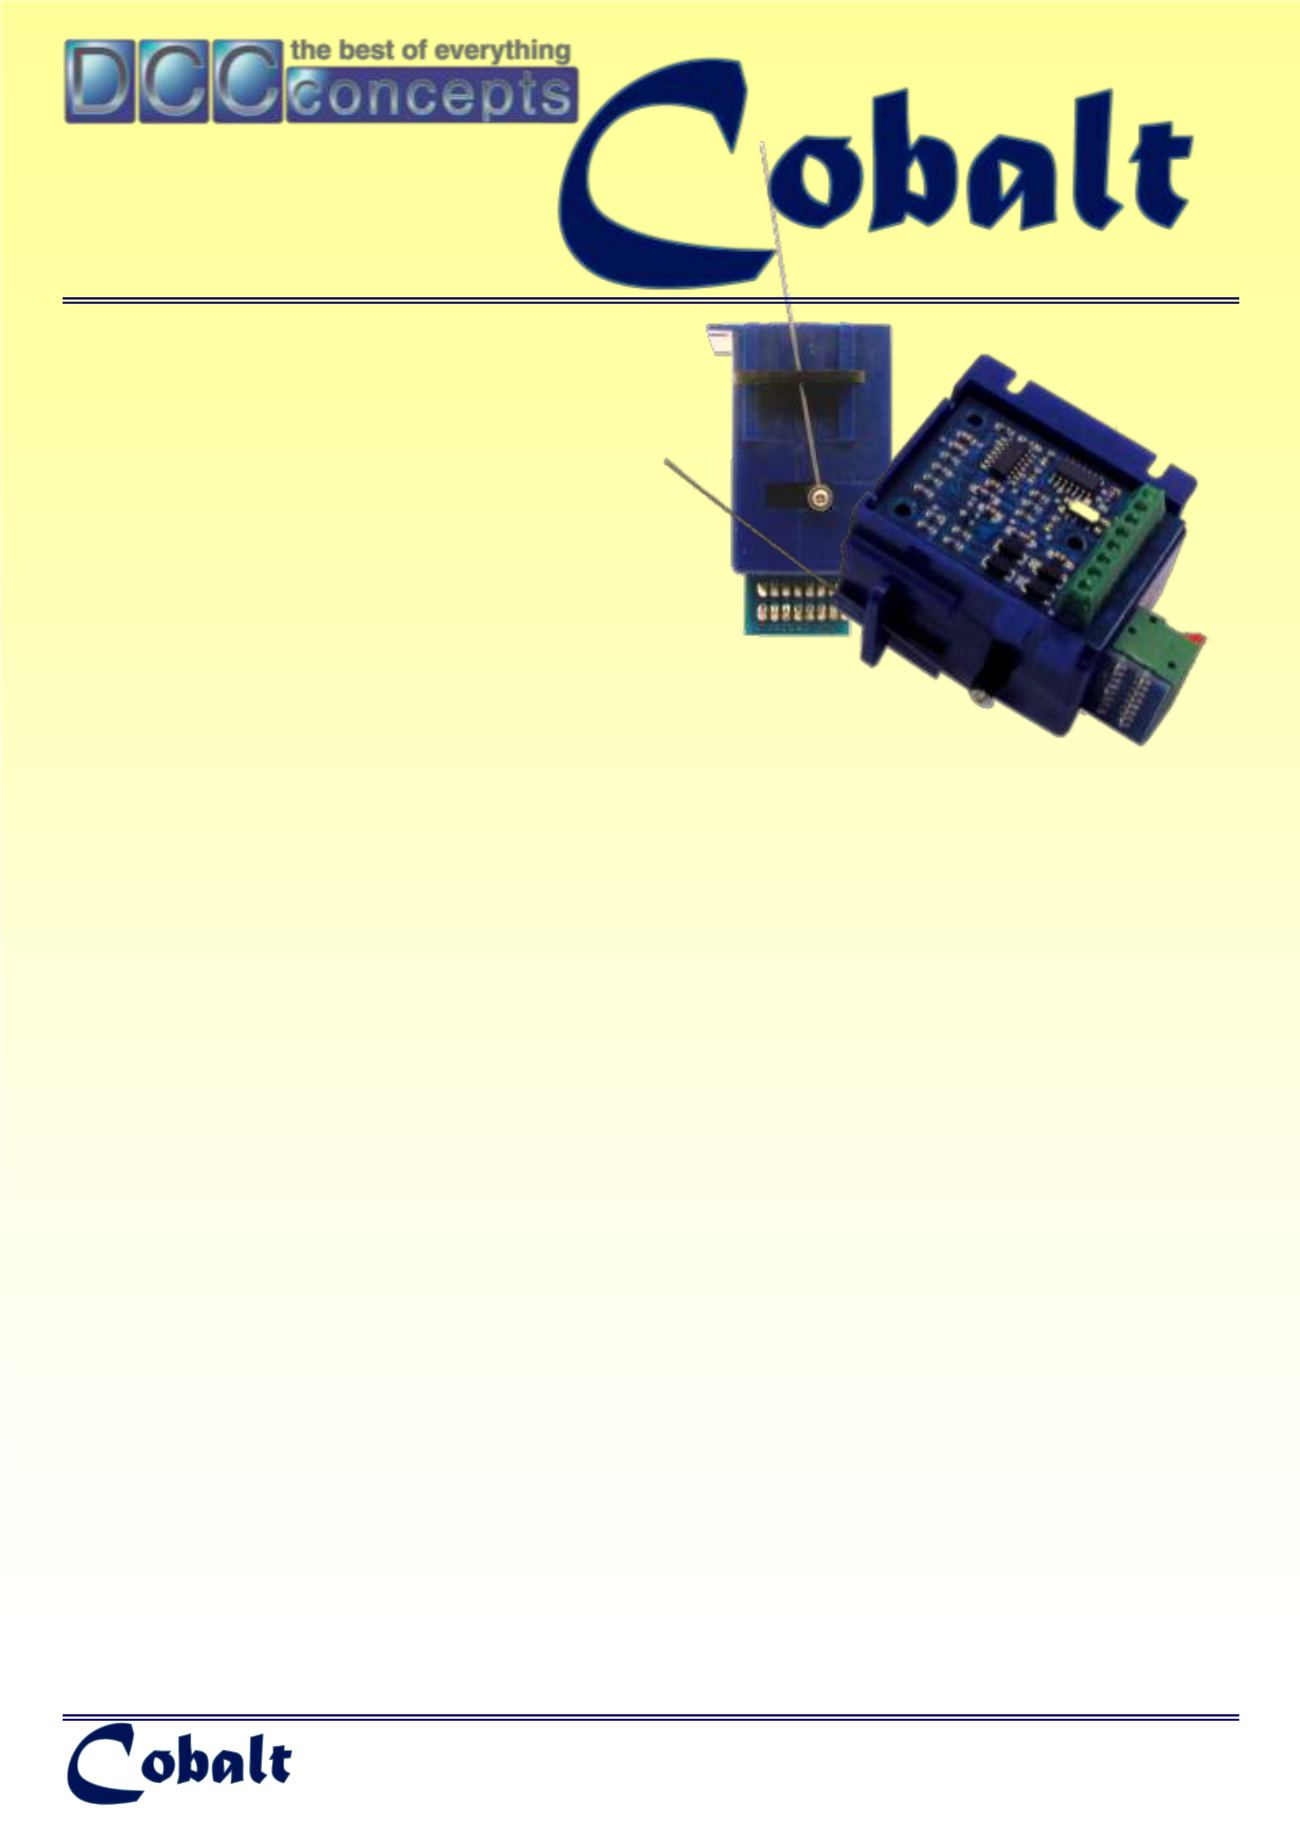 Dcc Cobalt Motor Circuitforcircuitconceptspage2jpg Page 2